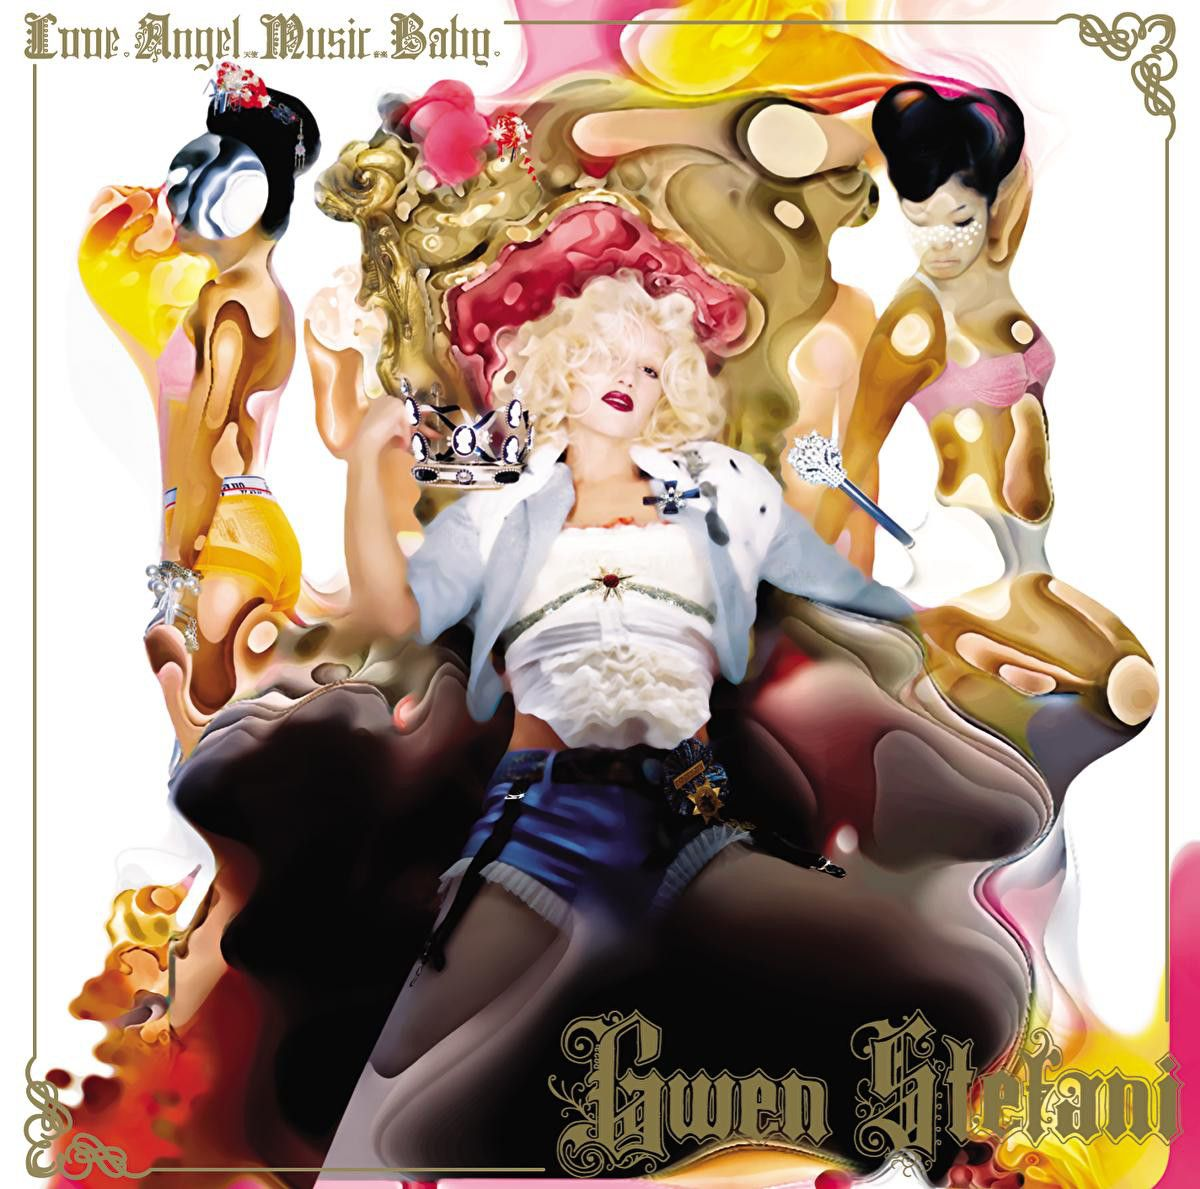 Gwen Stefani - Love, Angel, Music, Baby album cover